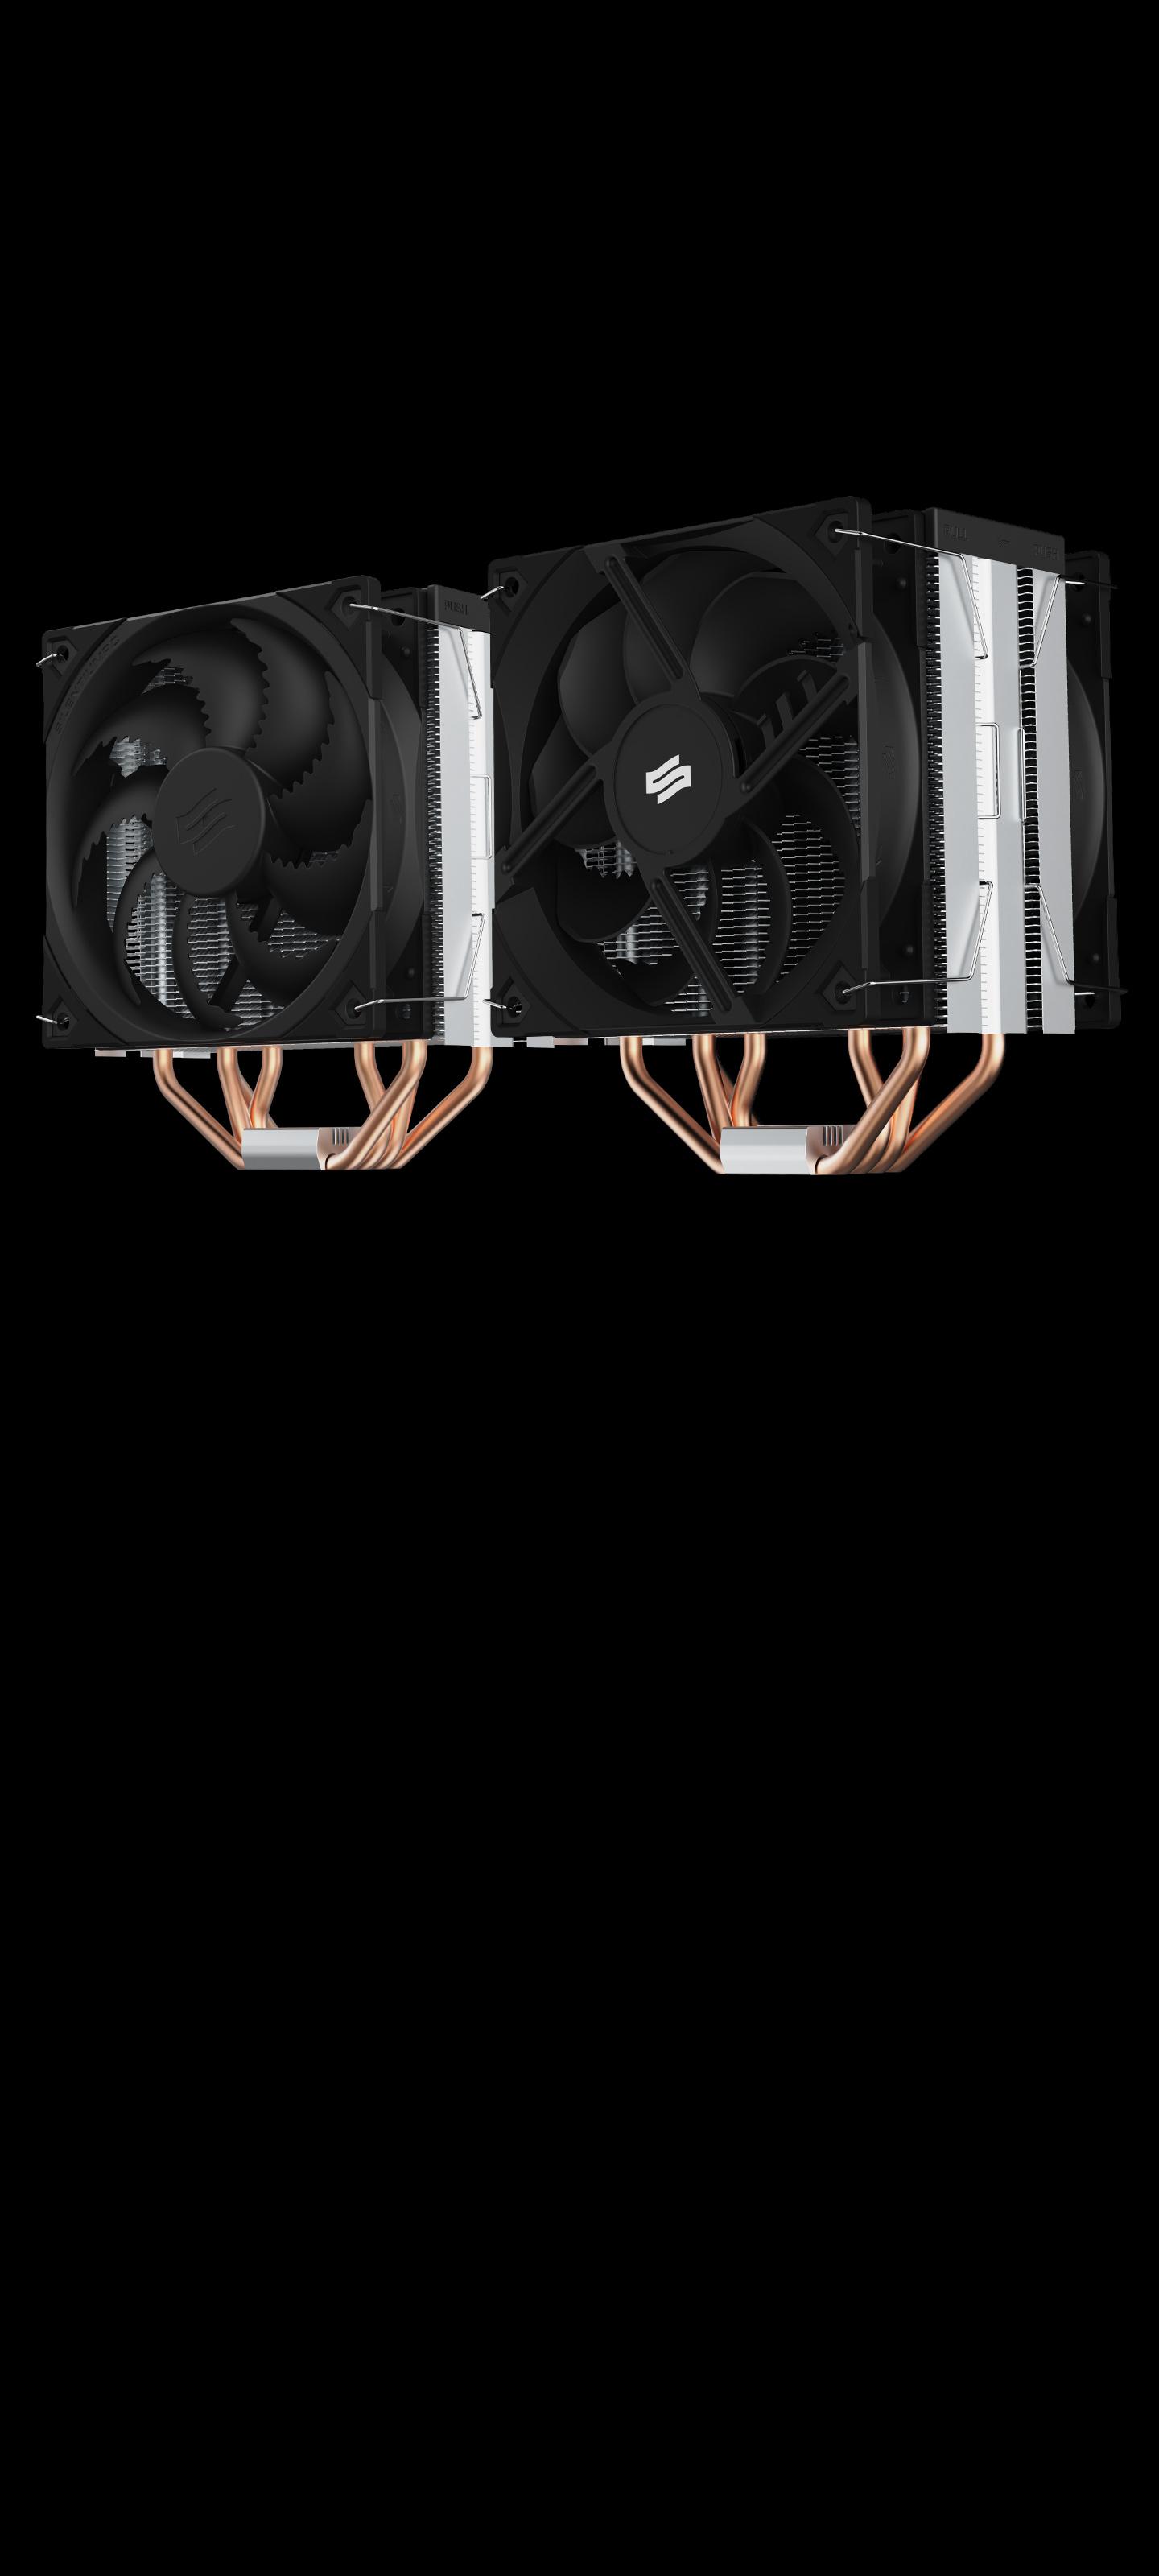 Fera 5 and Fera 5 Dual Fan